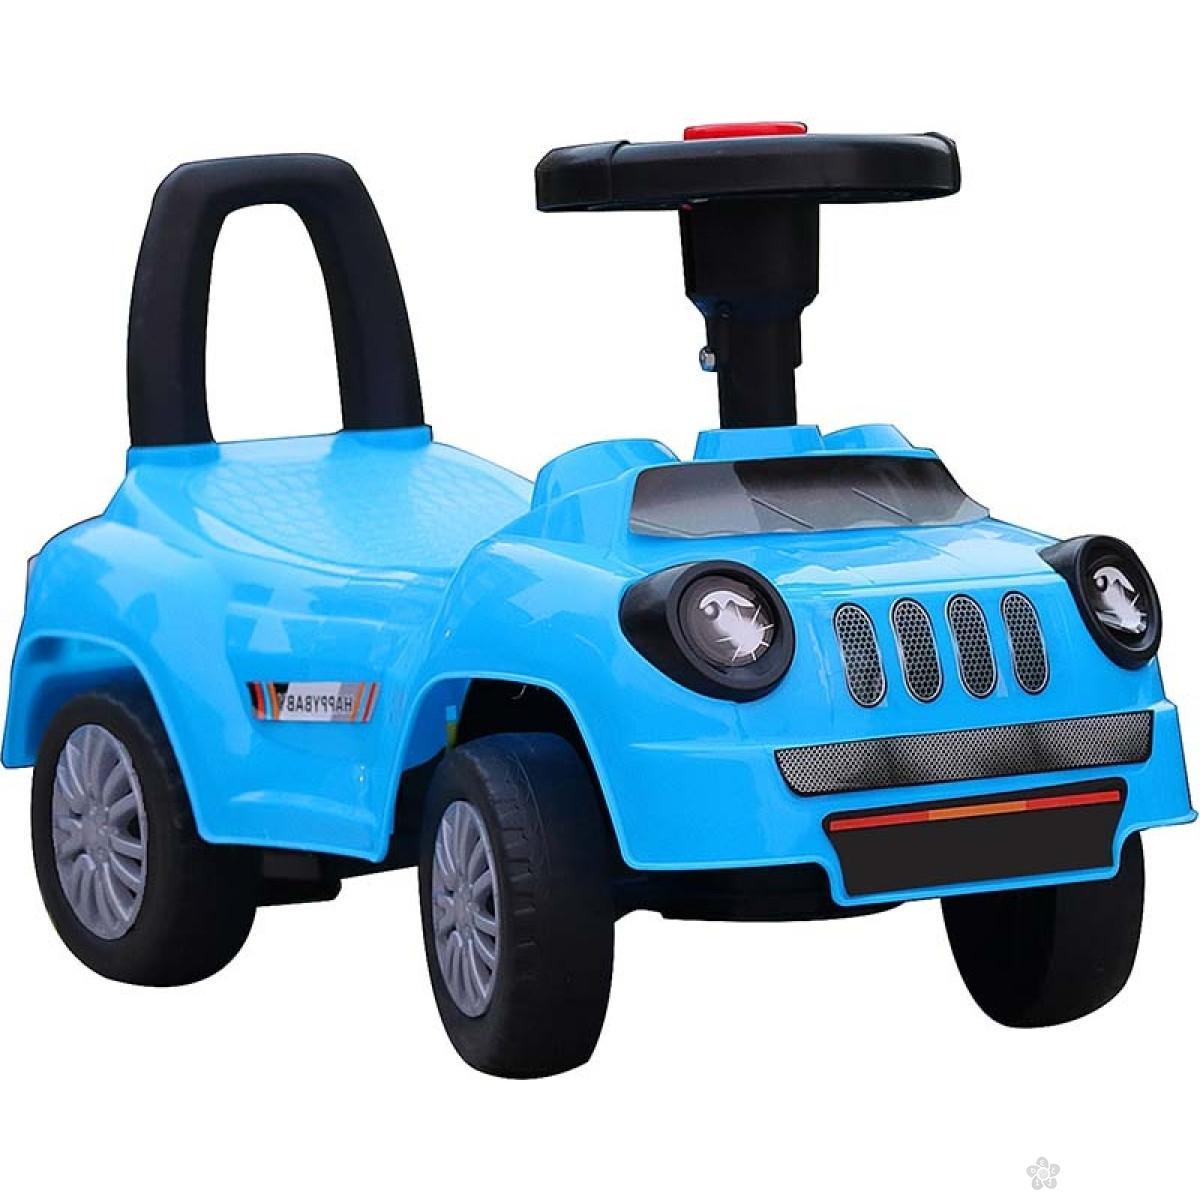 Dečija guralica Mini džip, 064907